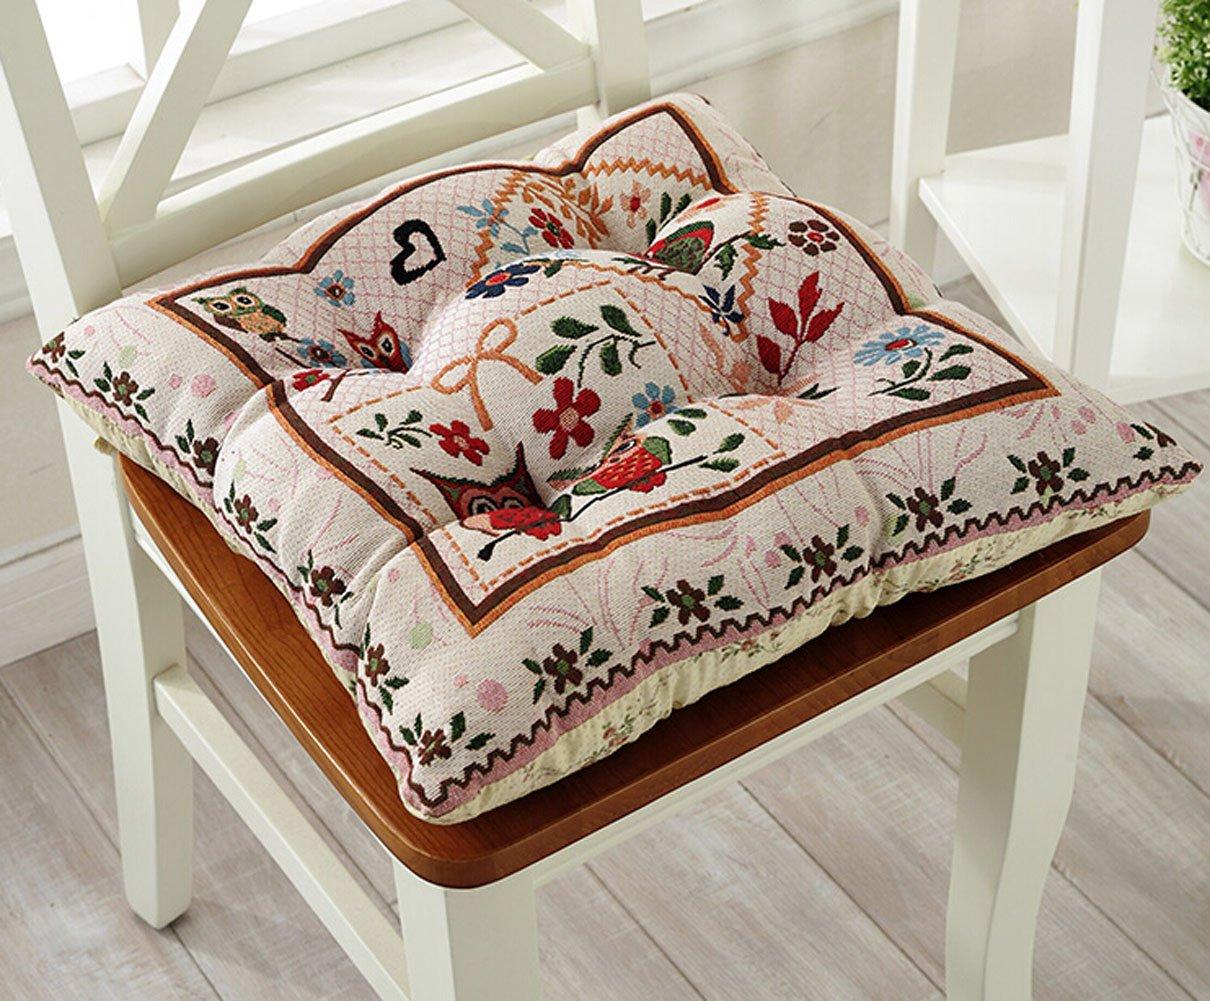 16.9x16.9 inch Cotton Seat Cushions Sofa Chair Cushion Pillow Chair Pads with Corner Ties (Type-1) VENDAR